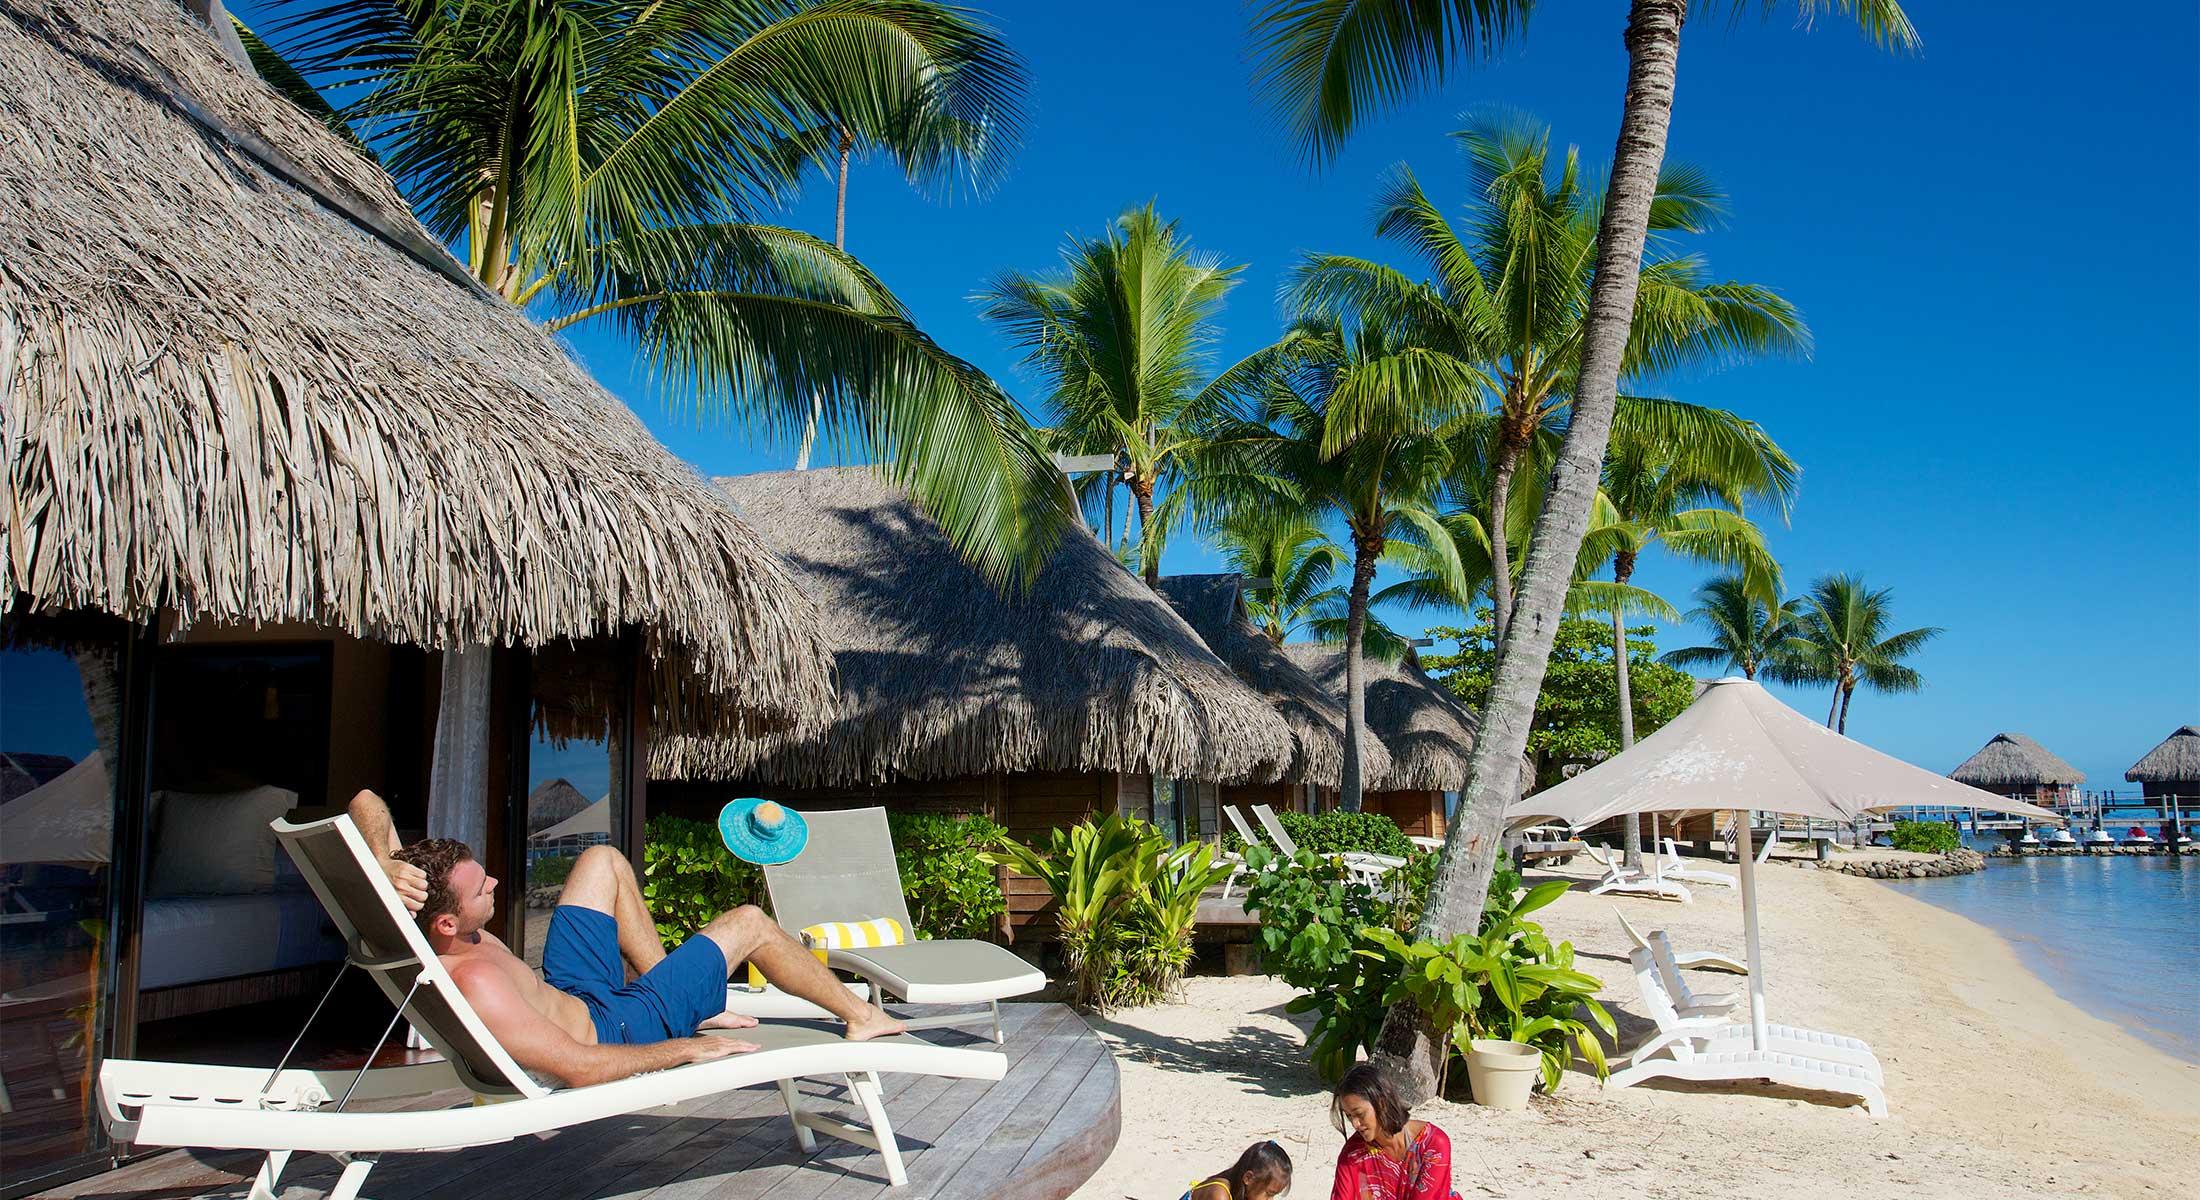 Accommodation  Beach Bungalow Moorea Hotel  Manava Beach